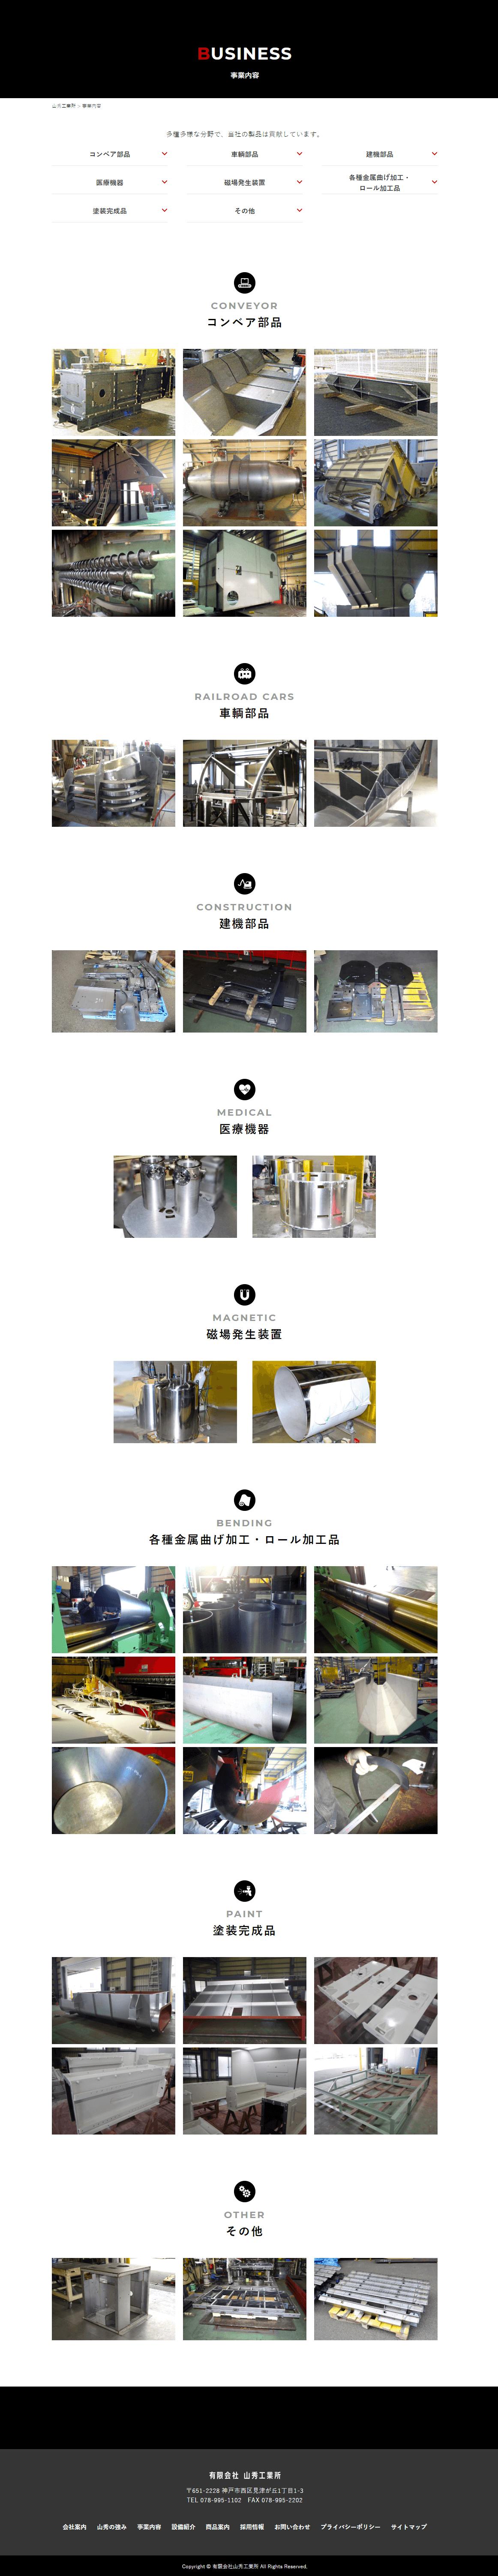 神戸市 有限会社山秀工業所 ホームページ制作2